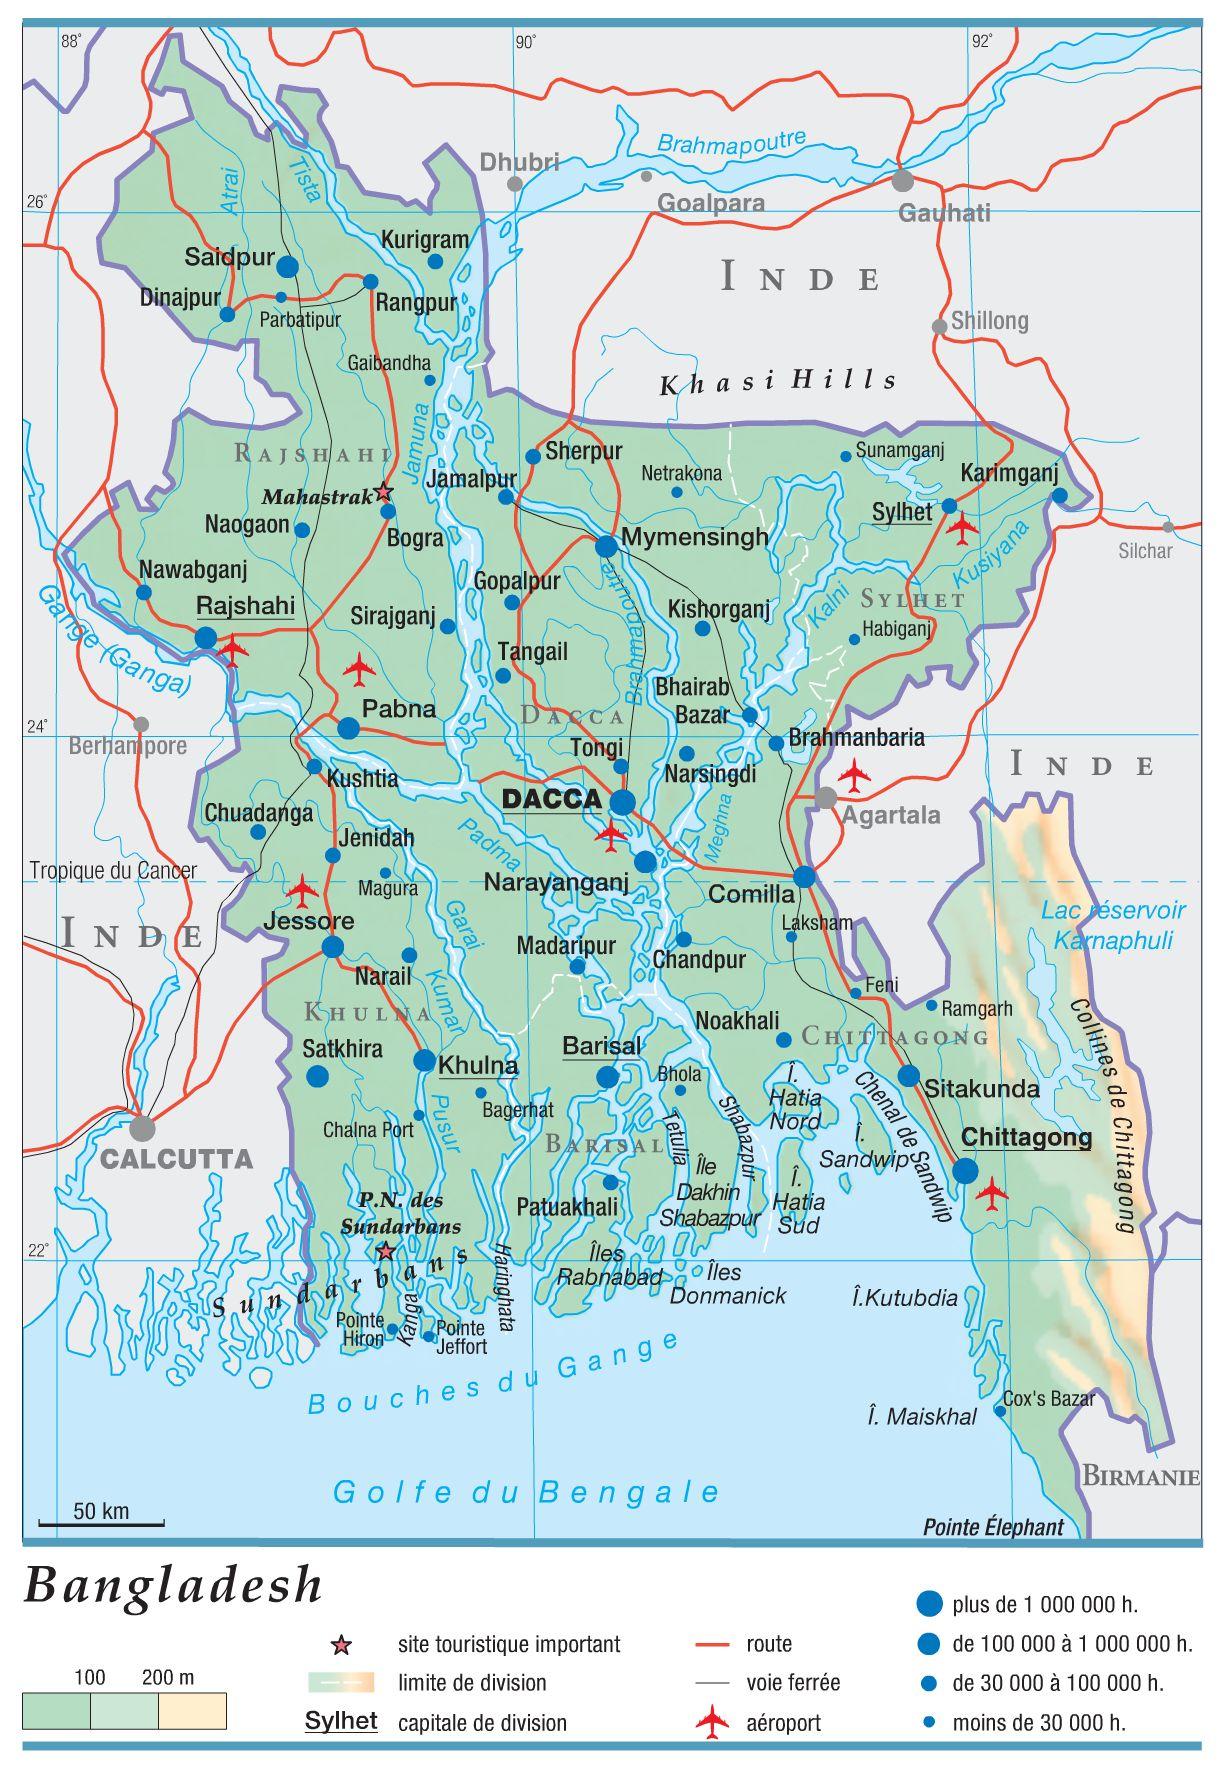 carte du bangladesh relief altitude villes